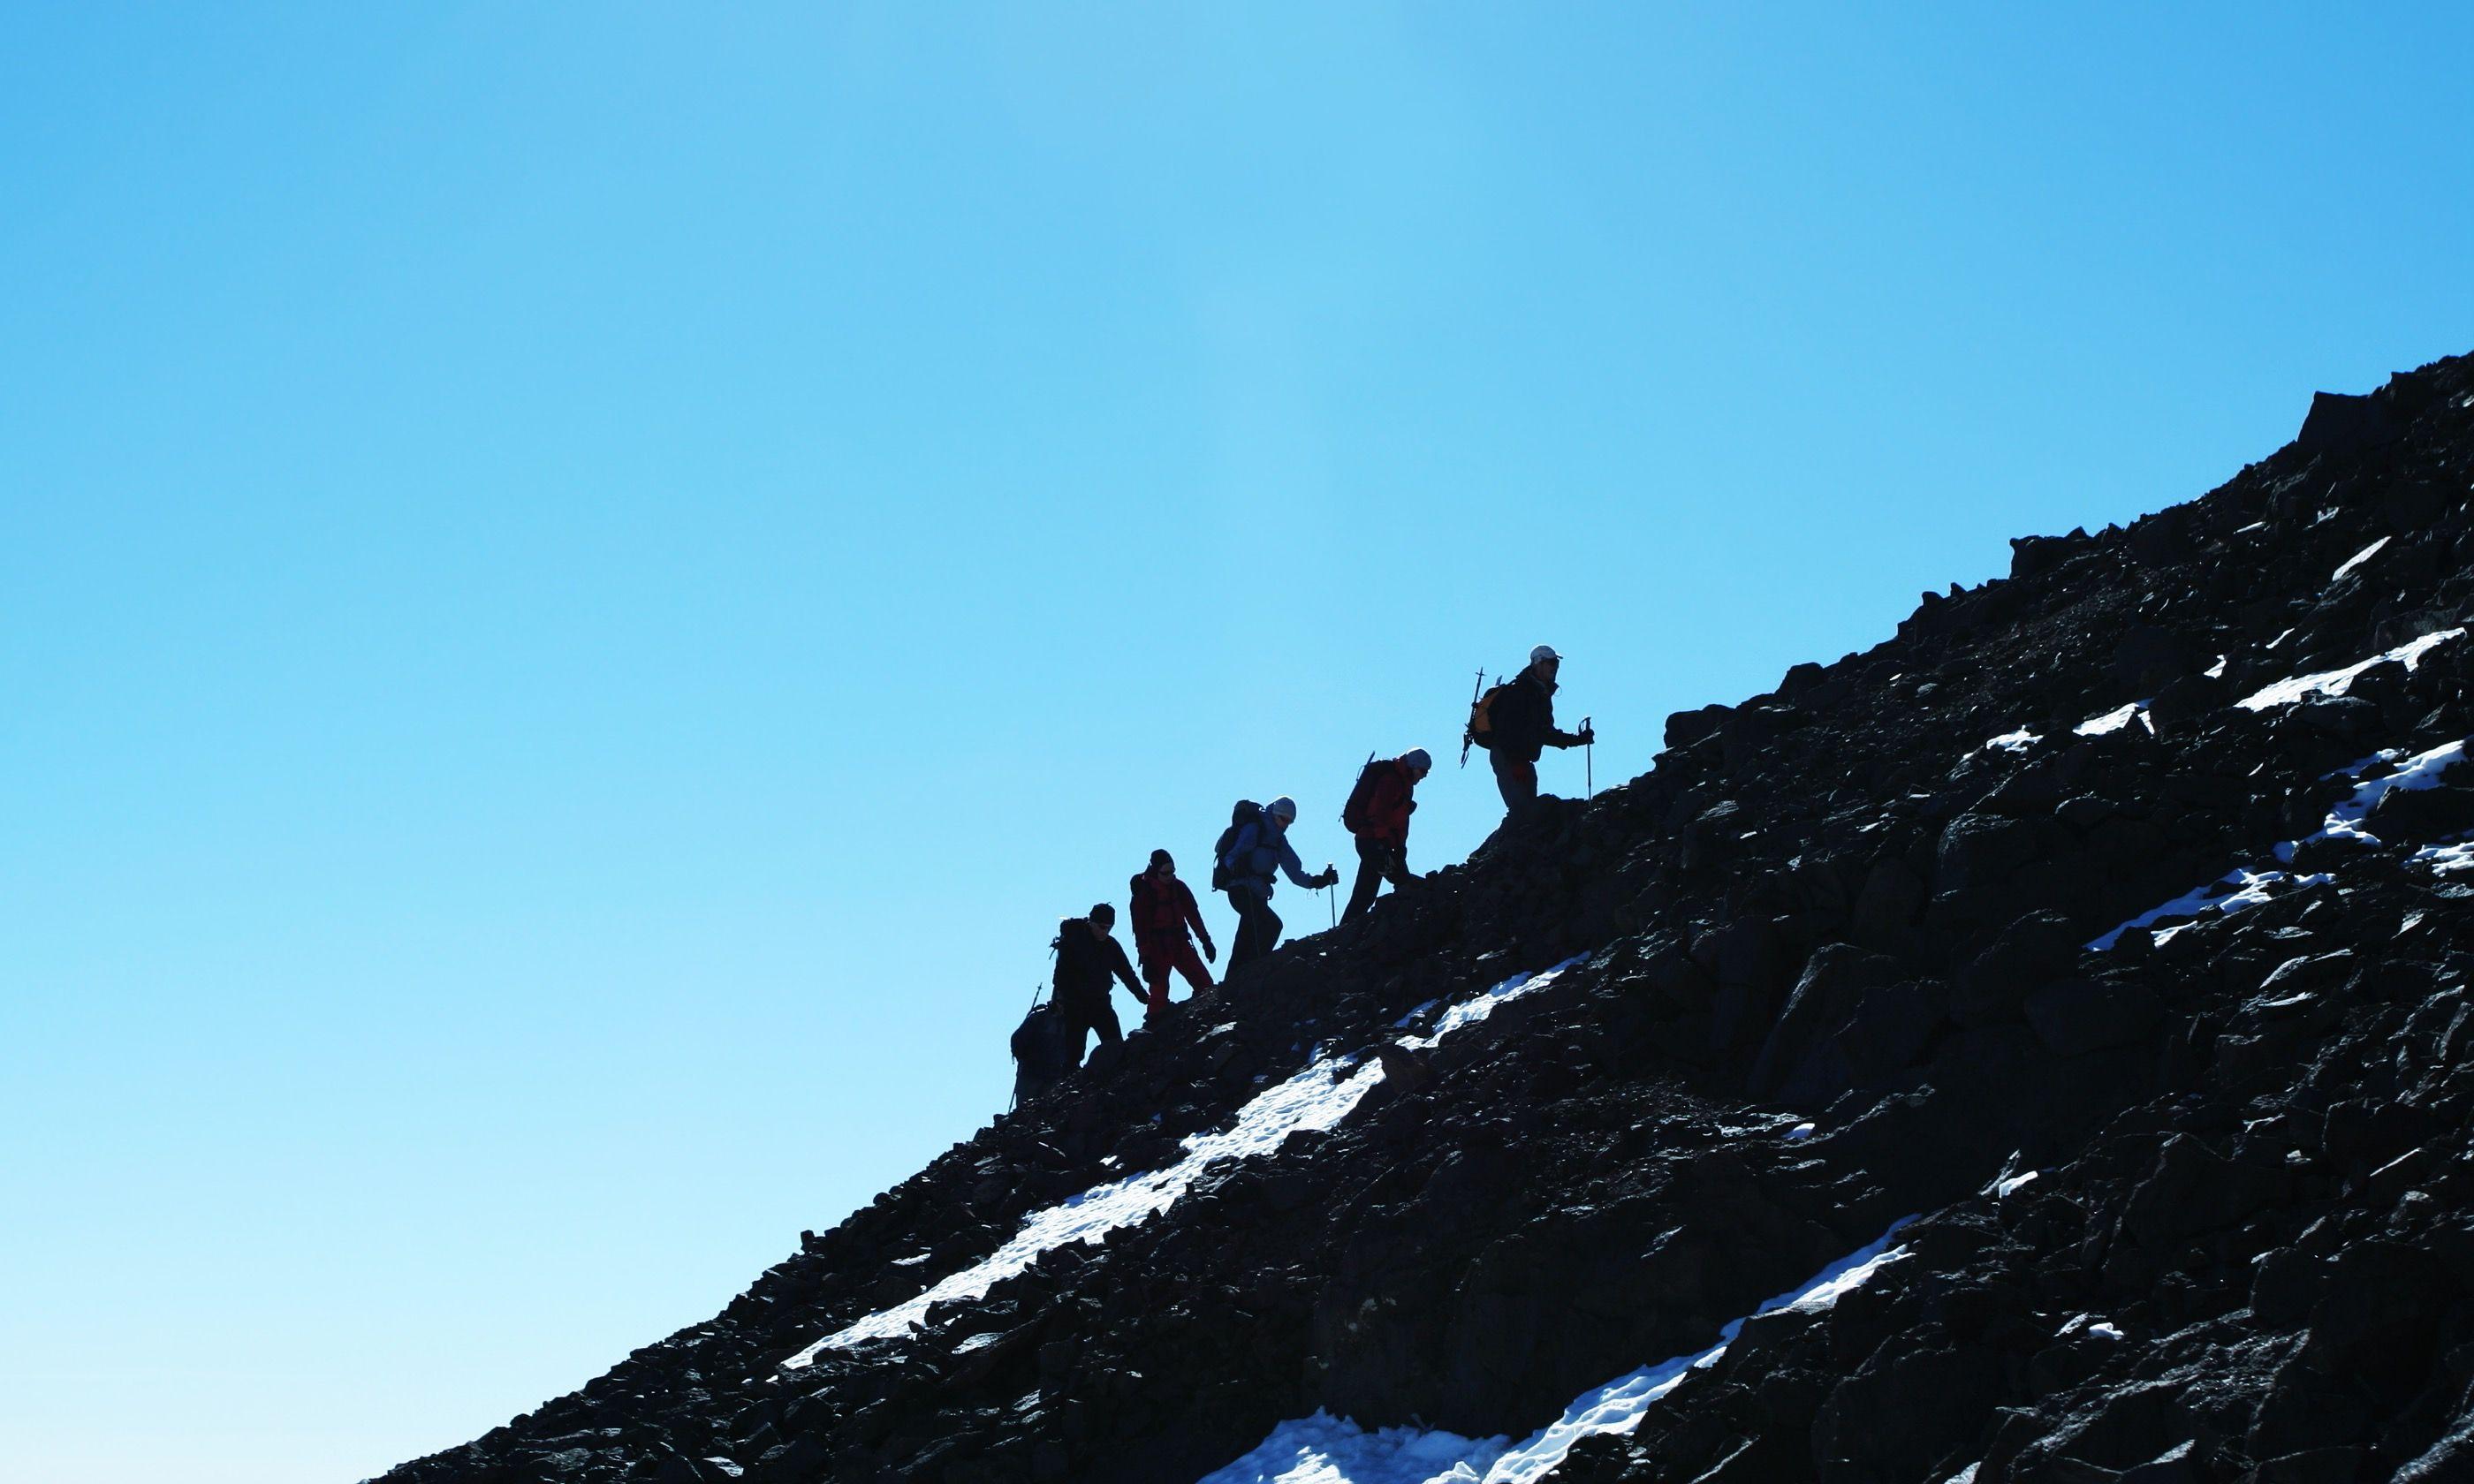 http://www.wanderlust.co.uk/tripfinder/operator/exodus_117/mt-toubkal-climb_6587